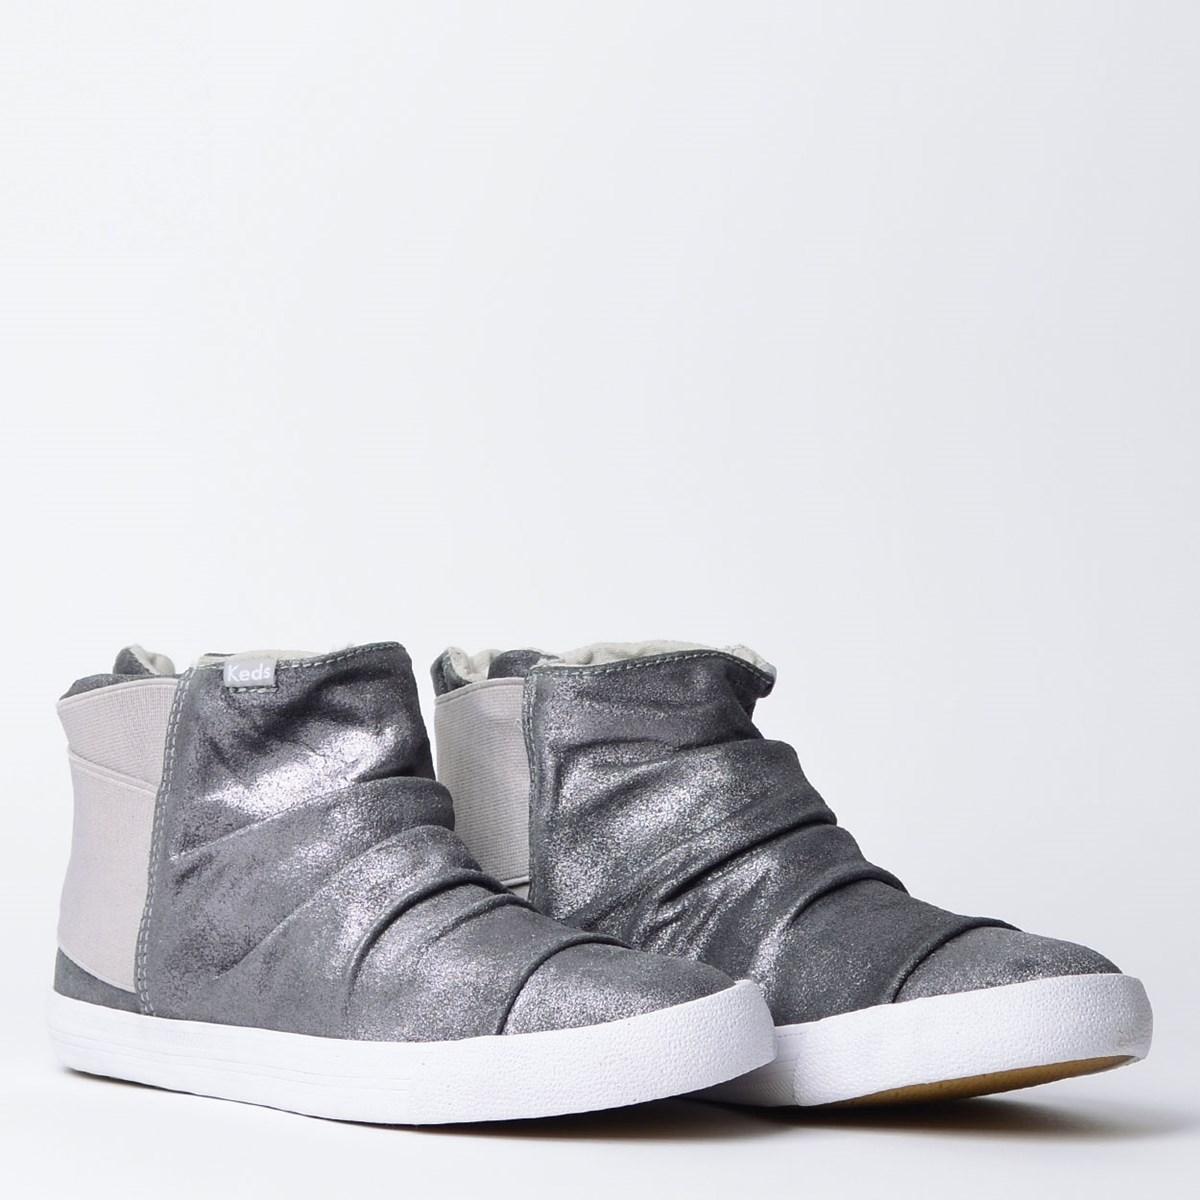 Tênis Keds Topkick Boot Gliter Suede Cinza KD1302016